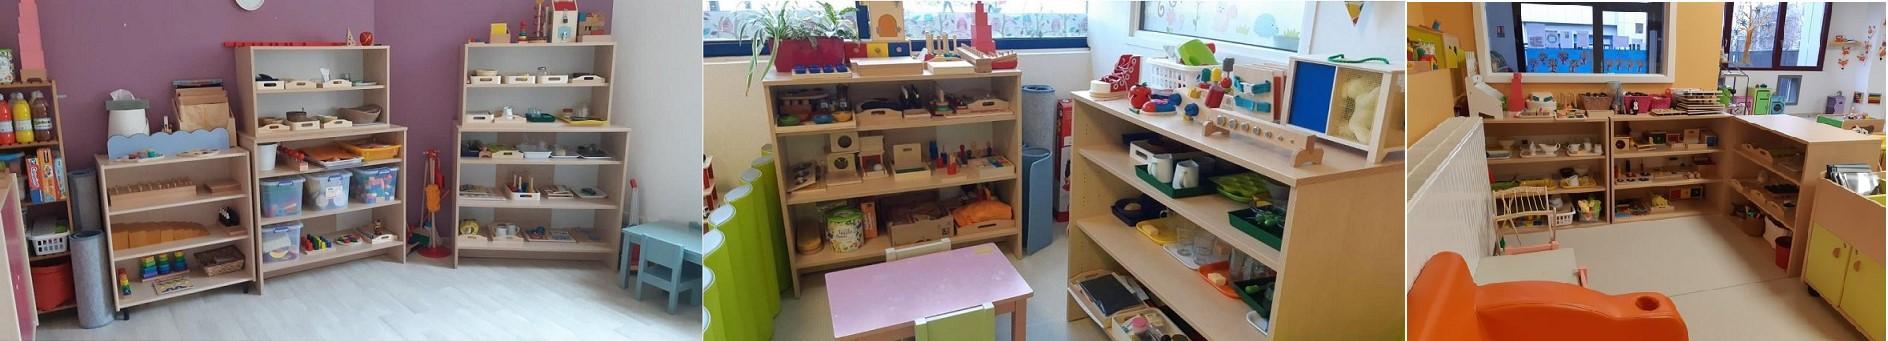 Montessori jeux 3 photos